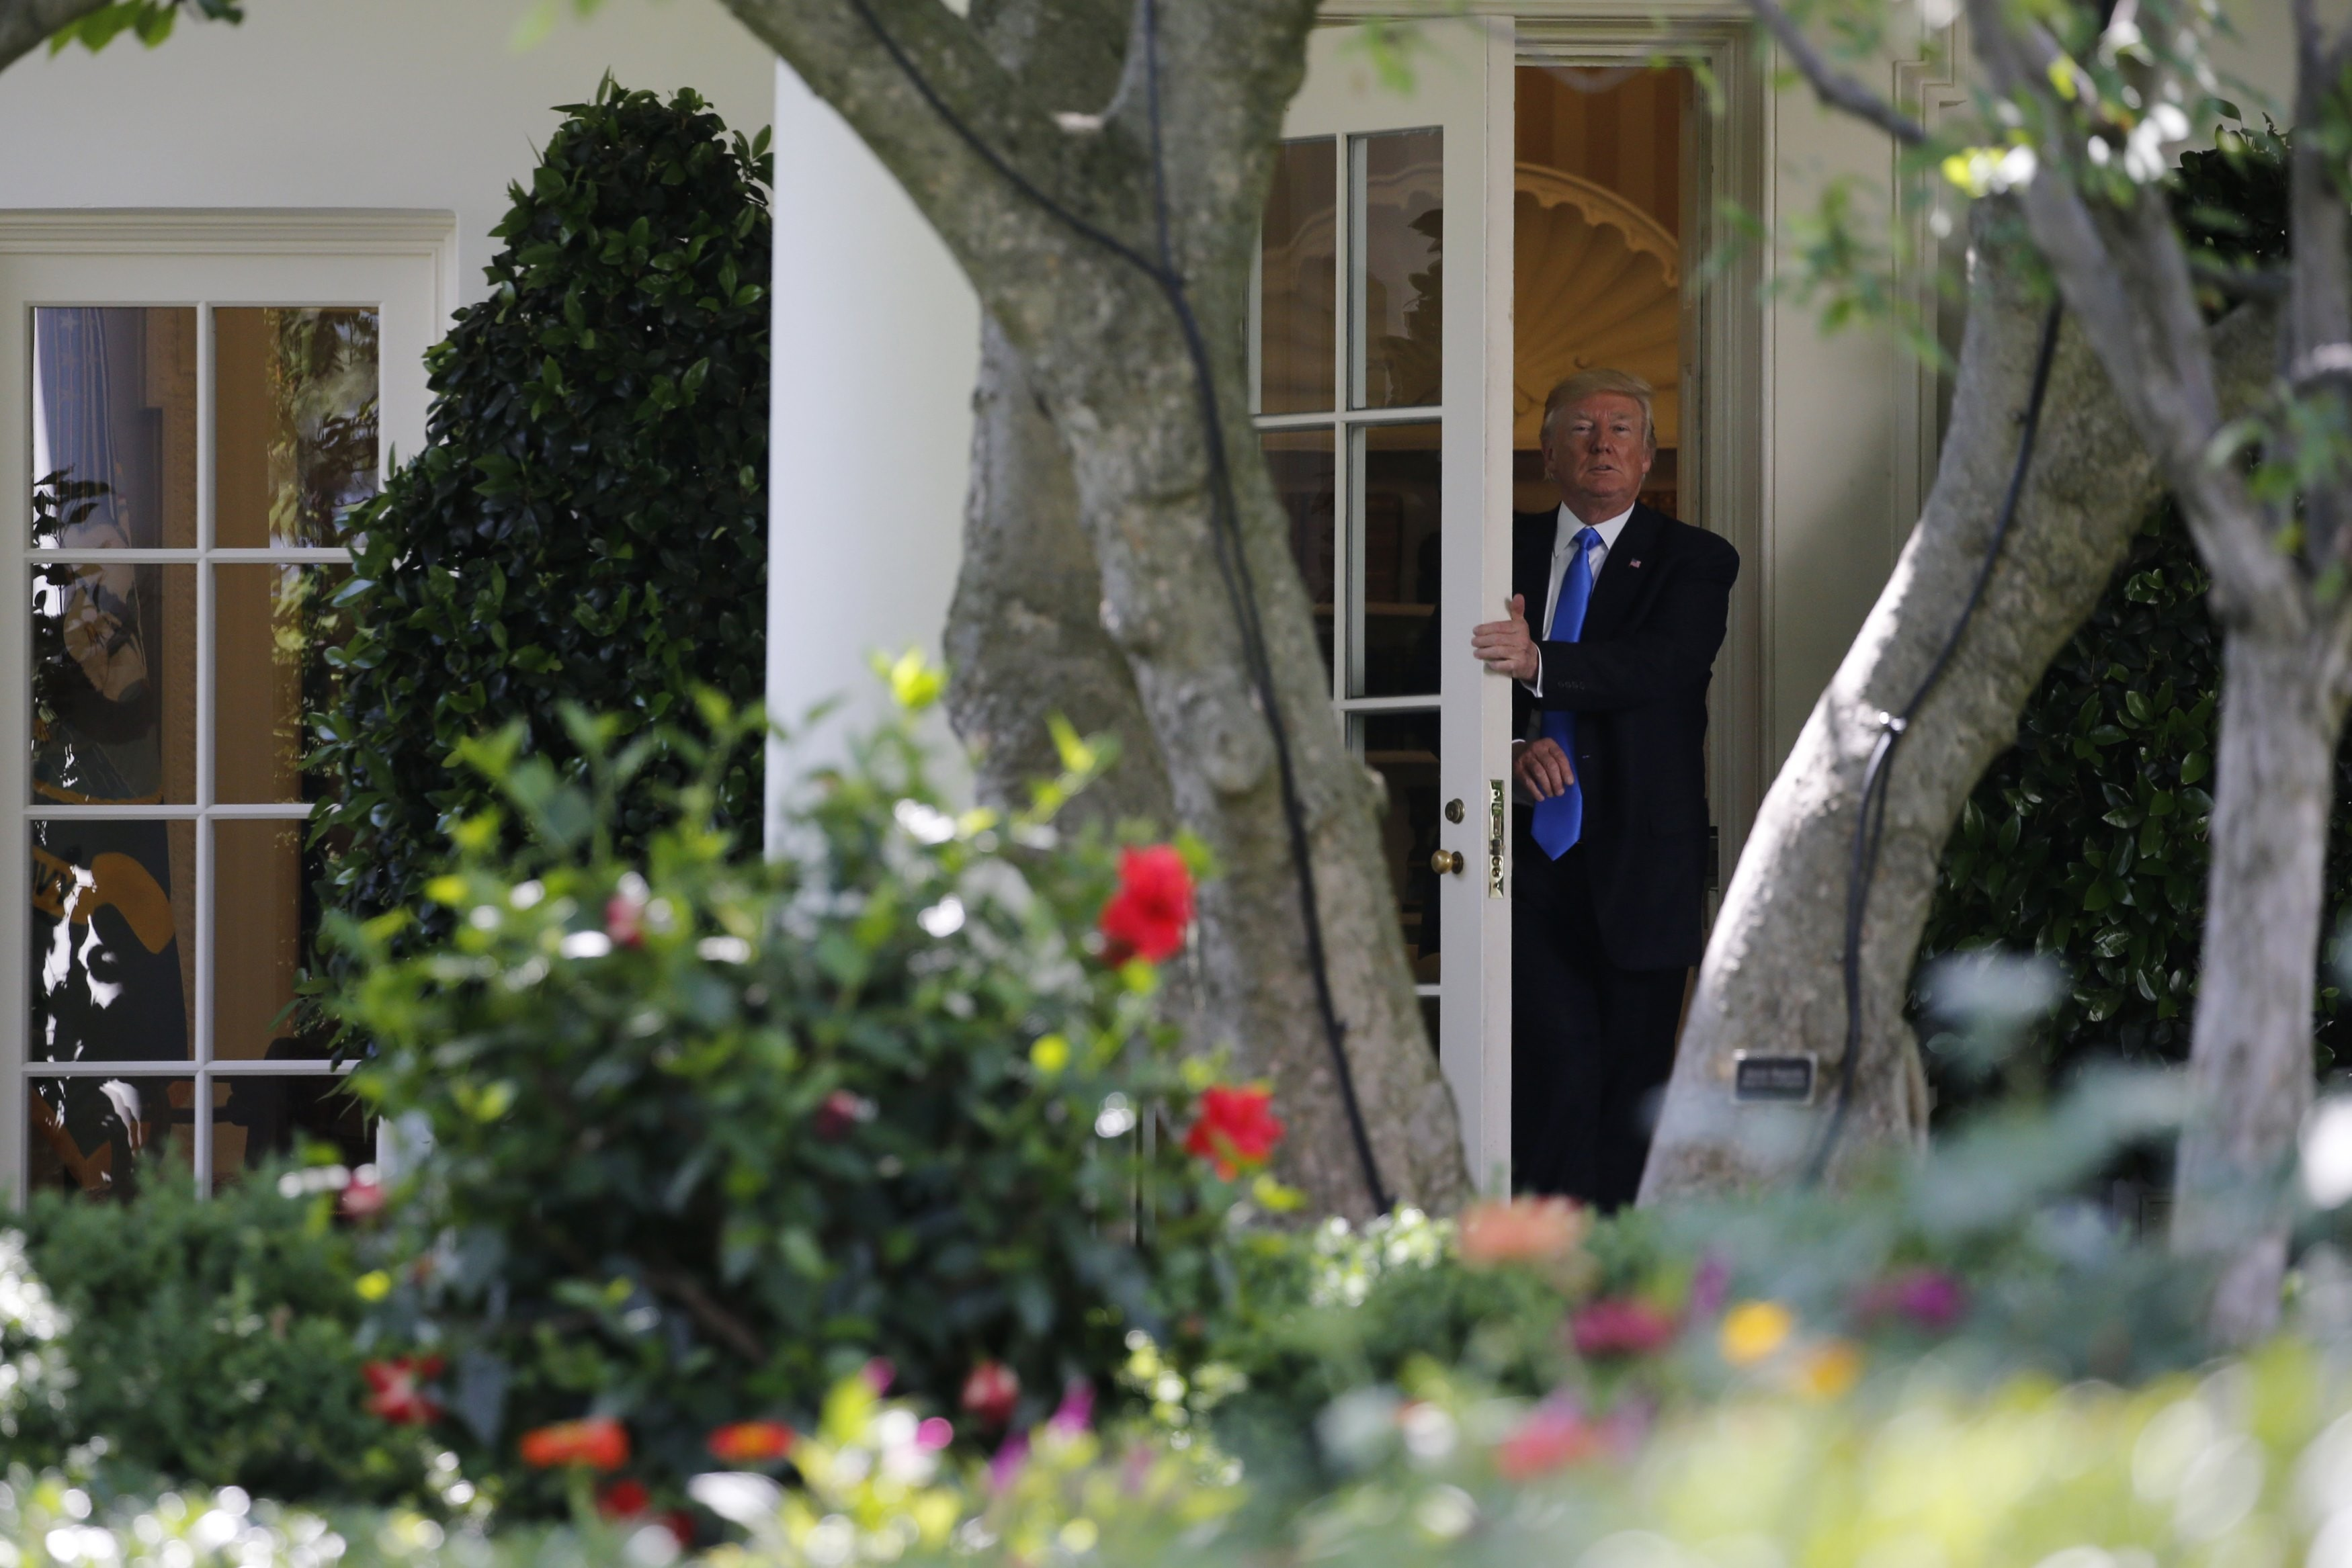 <p>Дональд Трамп в Белом доме. Фото: &copy;&nbsp;<span>REUTERS/Jonathan Ernst</span></p>